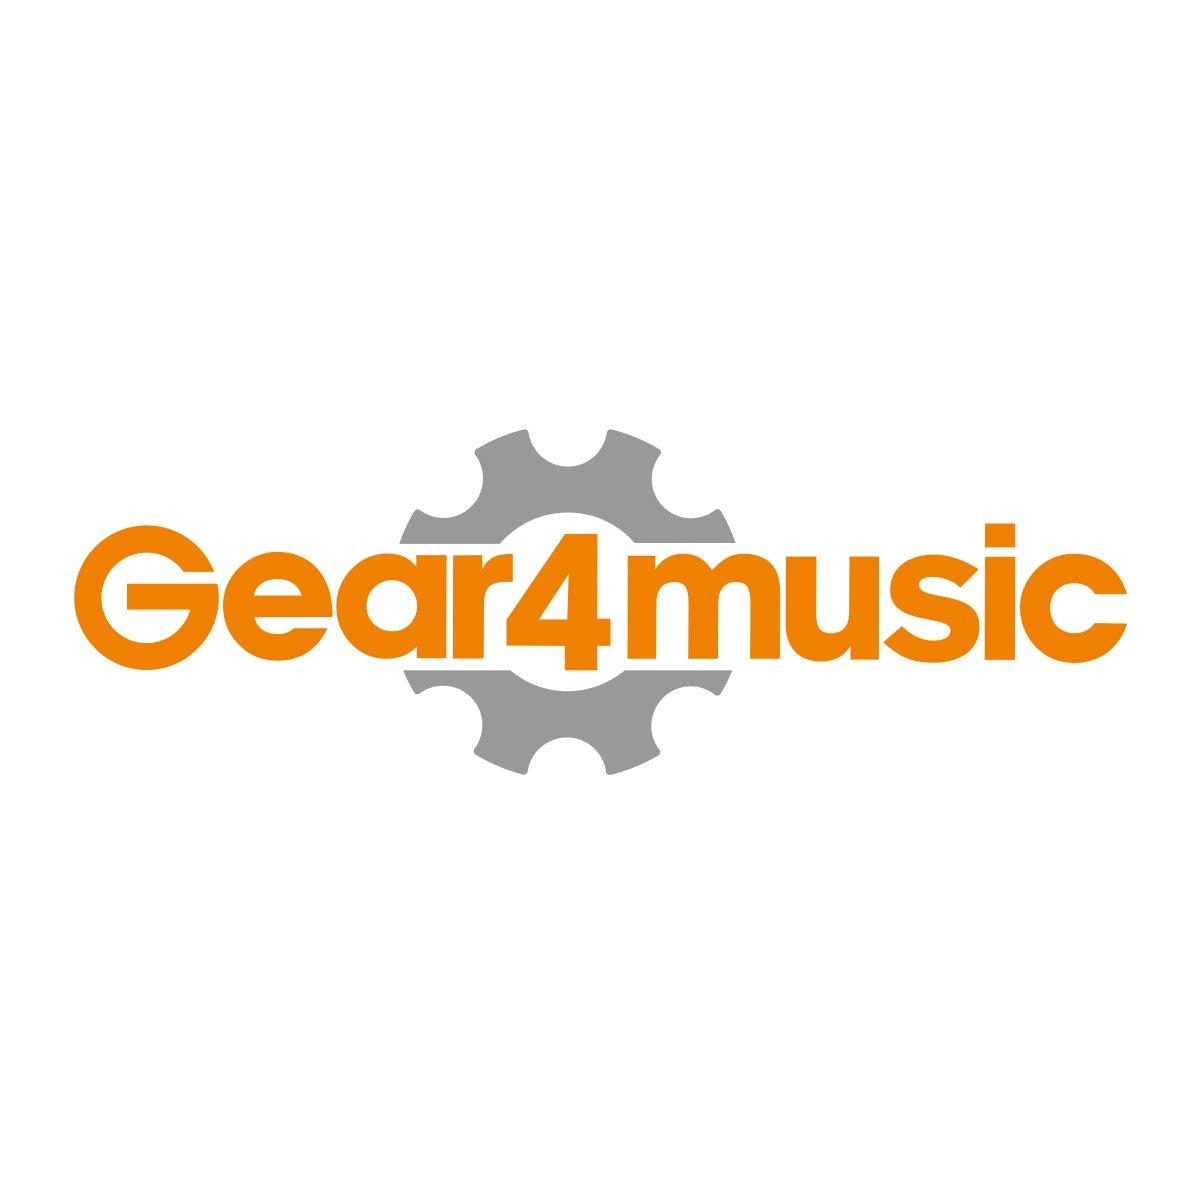 LED Crystal Ball Light by Gear4music